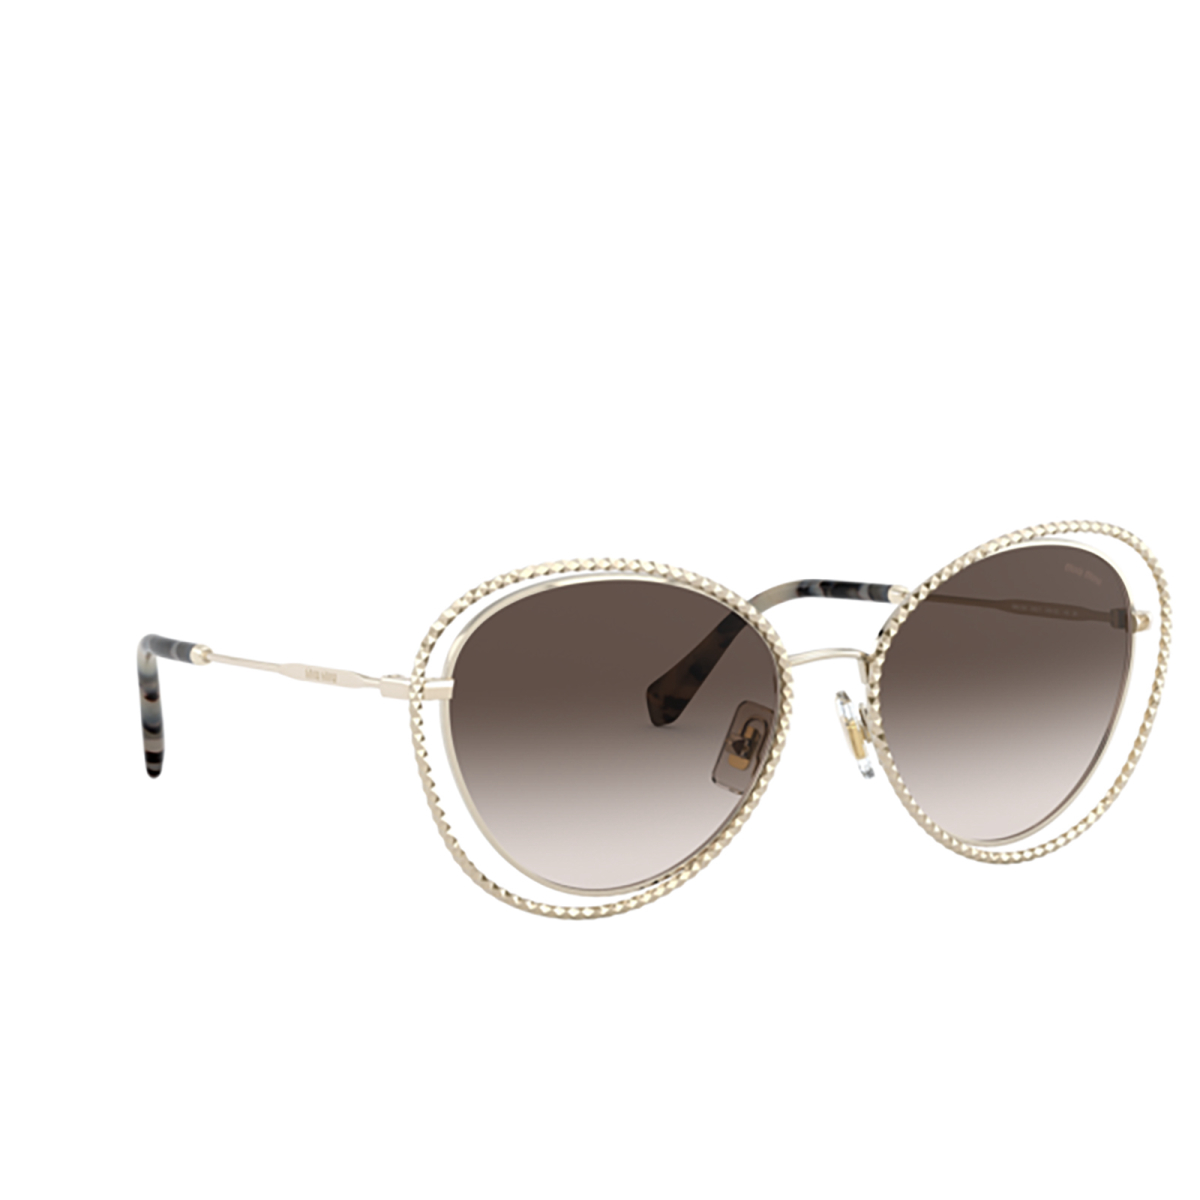 Miu Miu® Butterfly Sunglasses: Special Project MU 59VS color Pale Gold ZVN6S1.